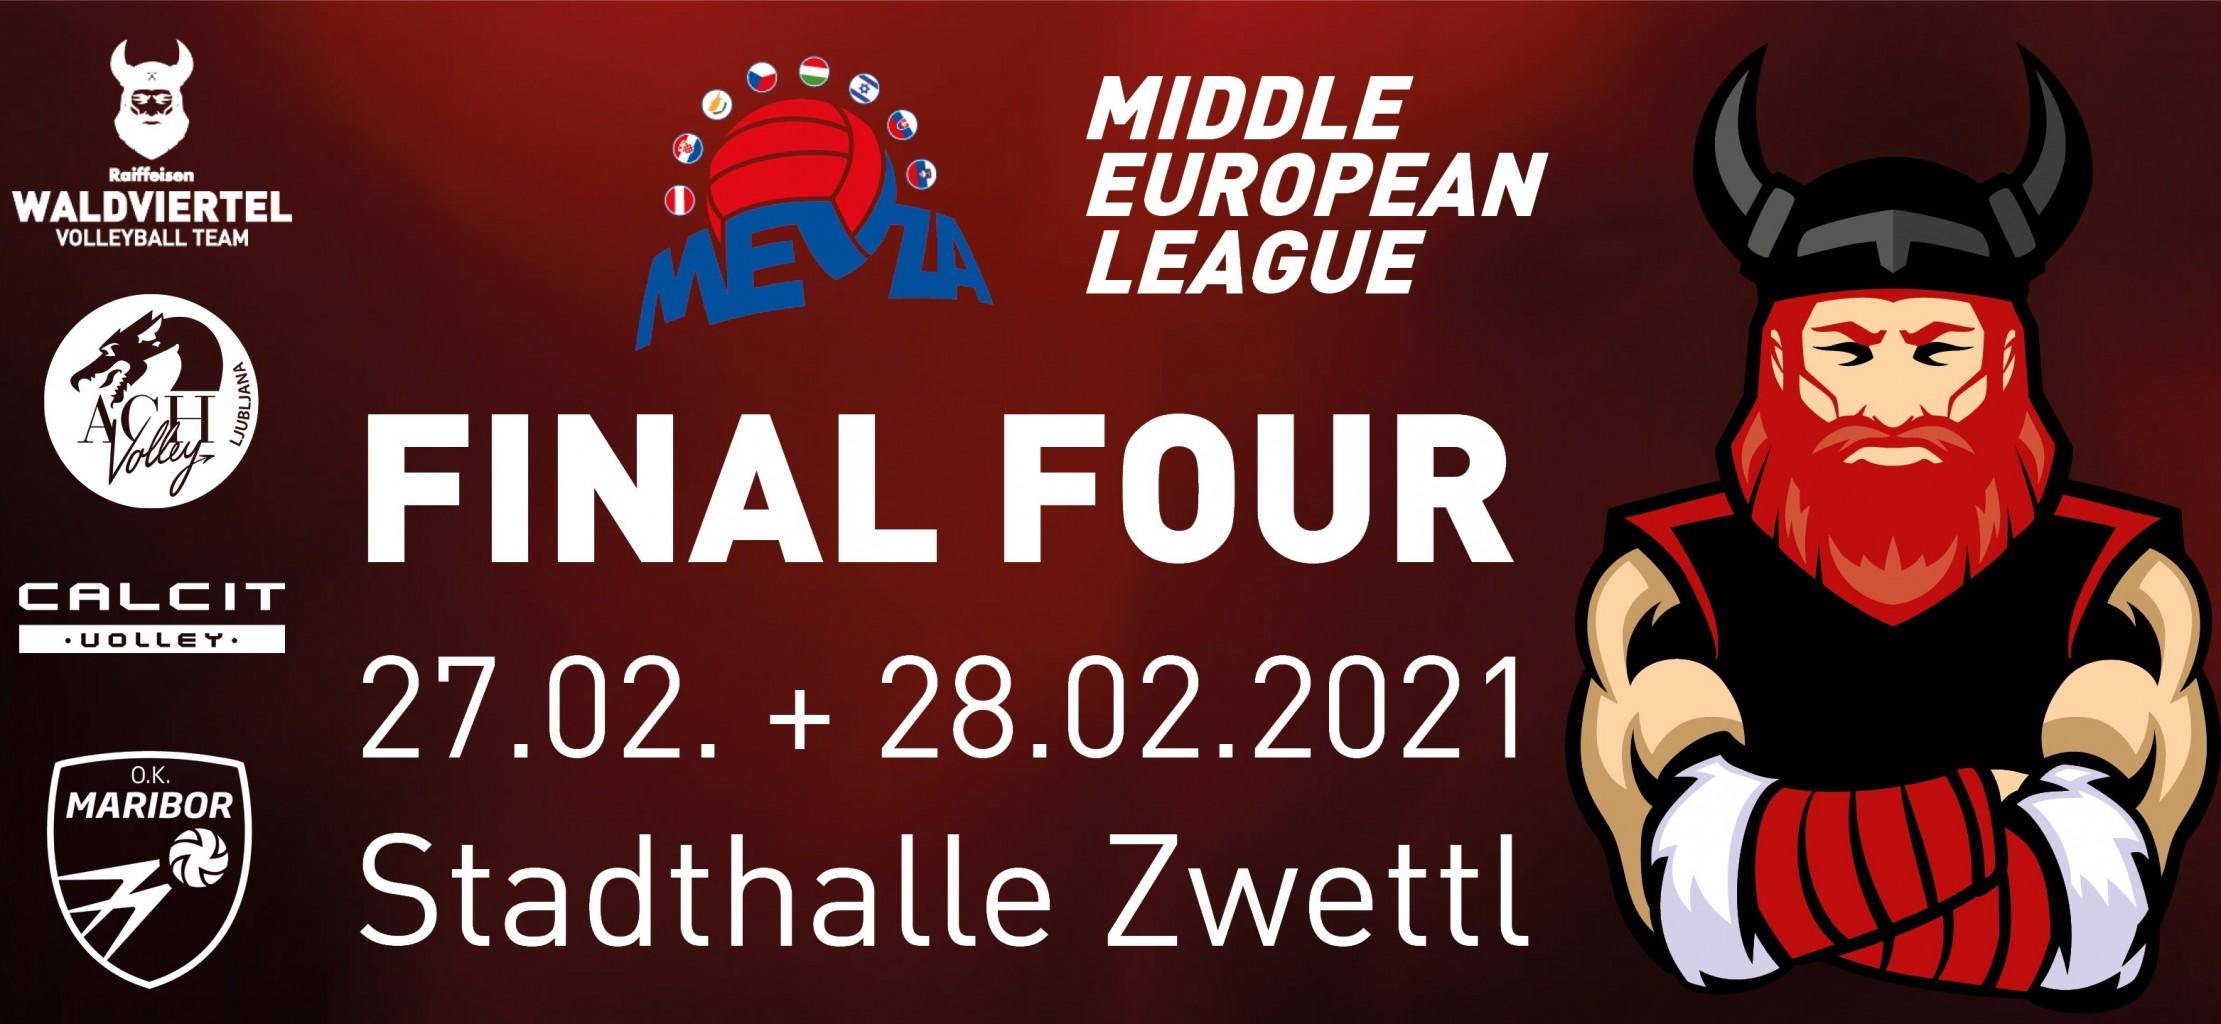 MEVZA Final Four live miterleben!